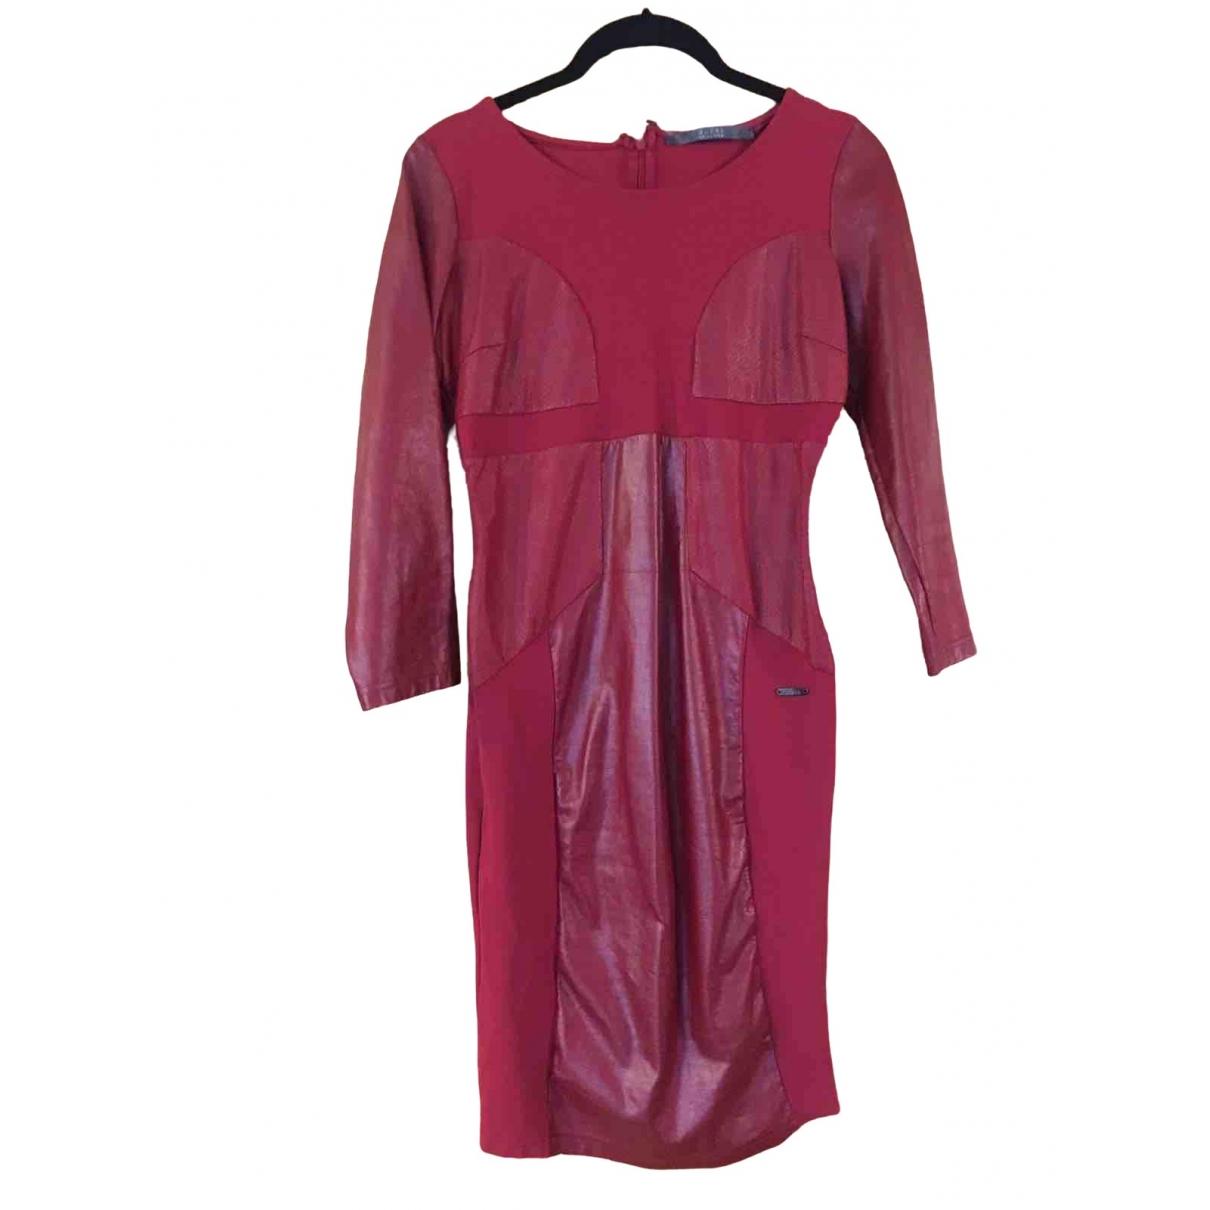 Guess \N Kleid in  Bordeauxrot Polyester